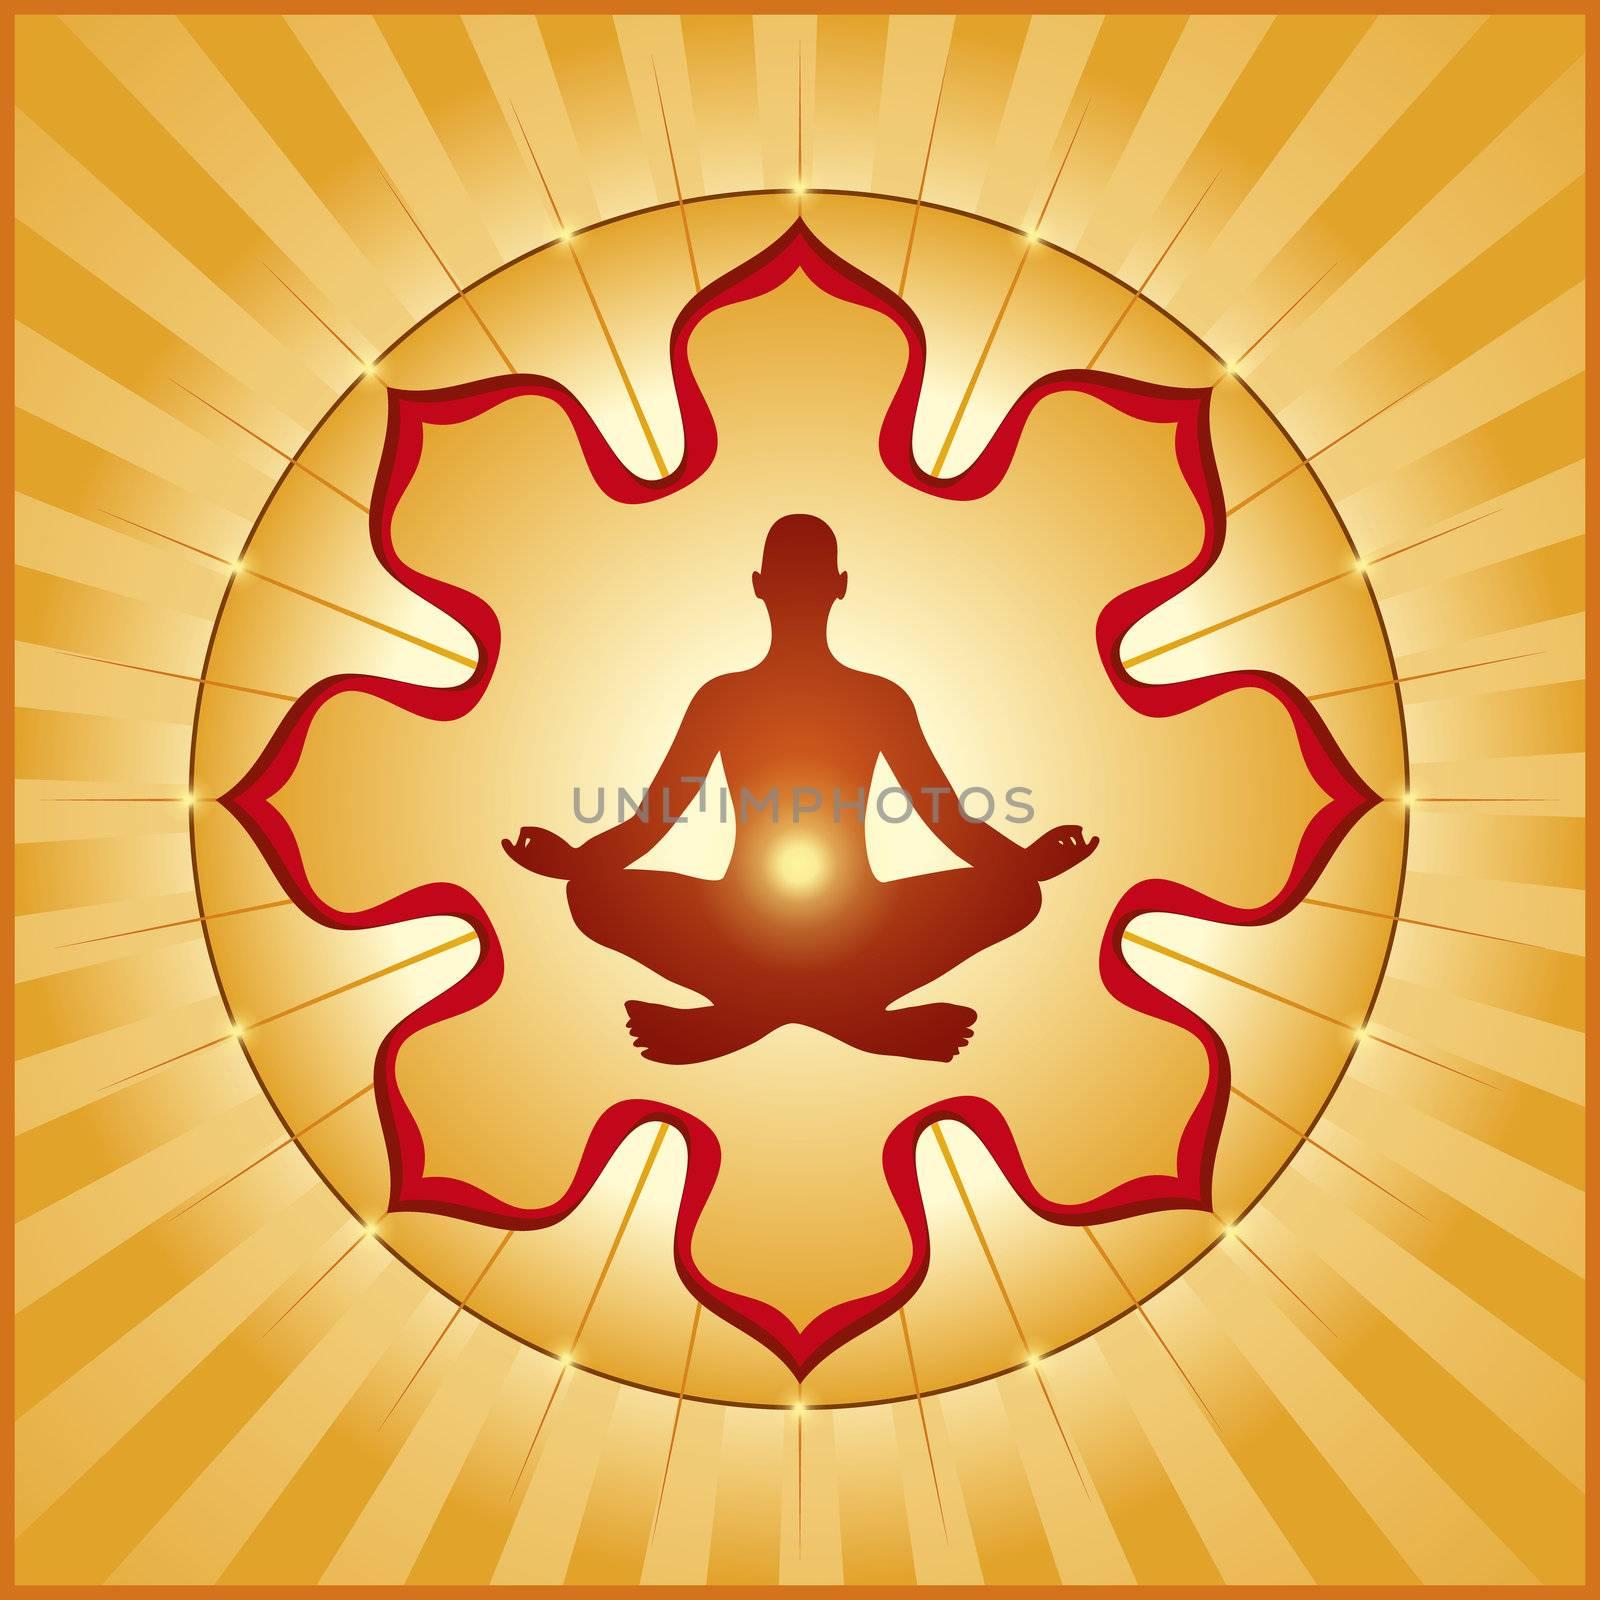 An image of a nice orange yoga graphic